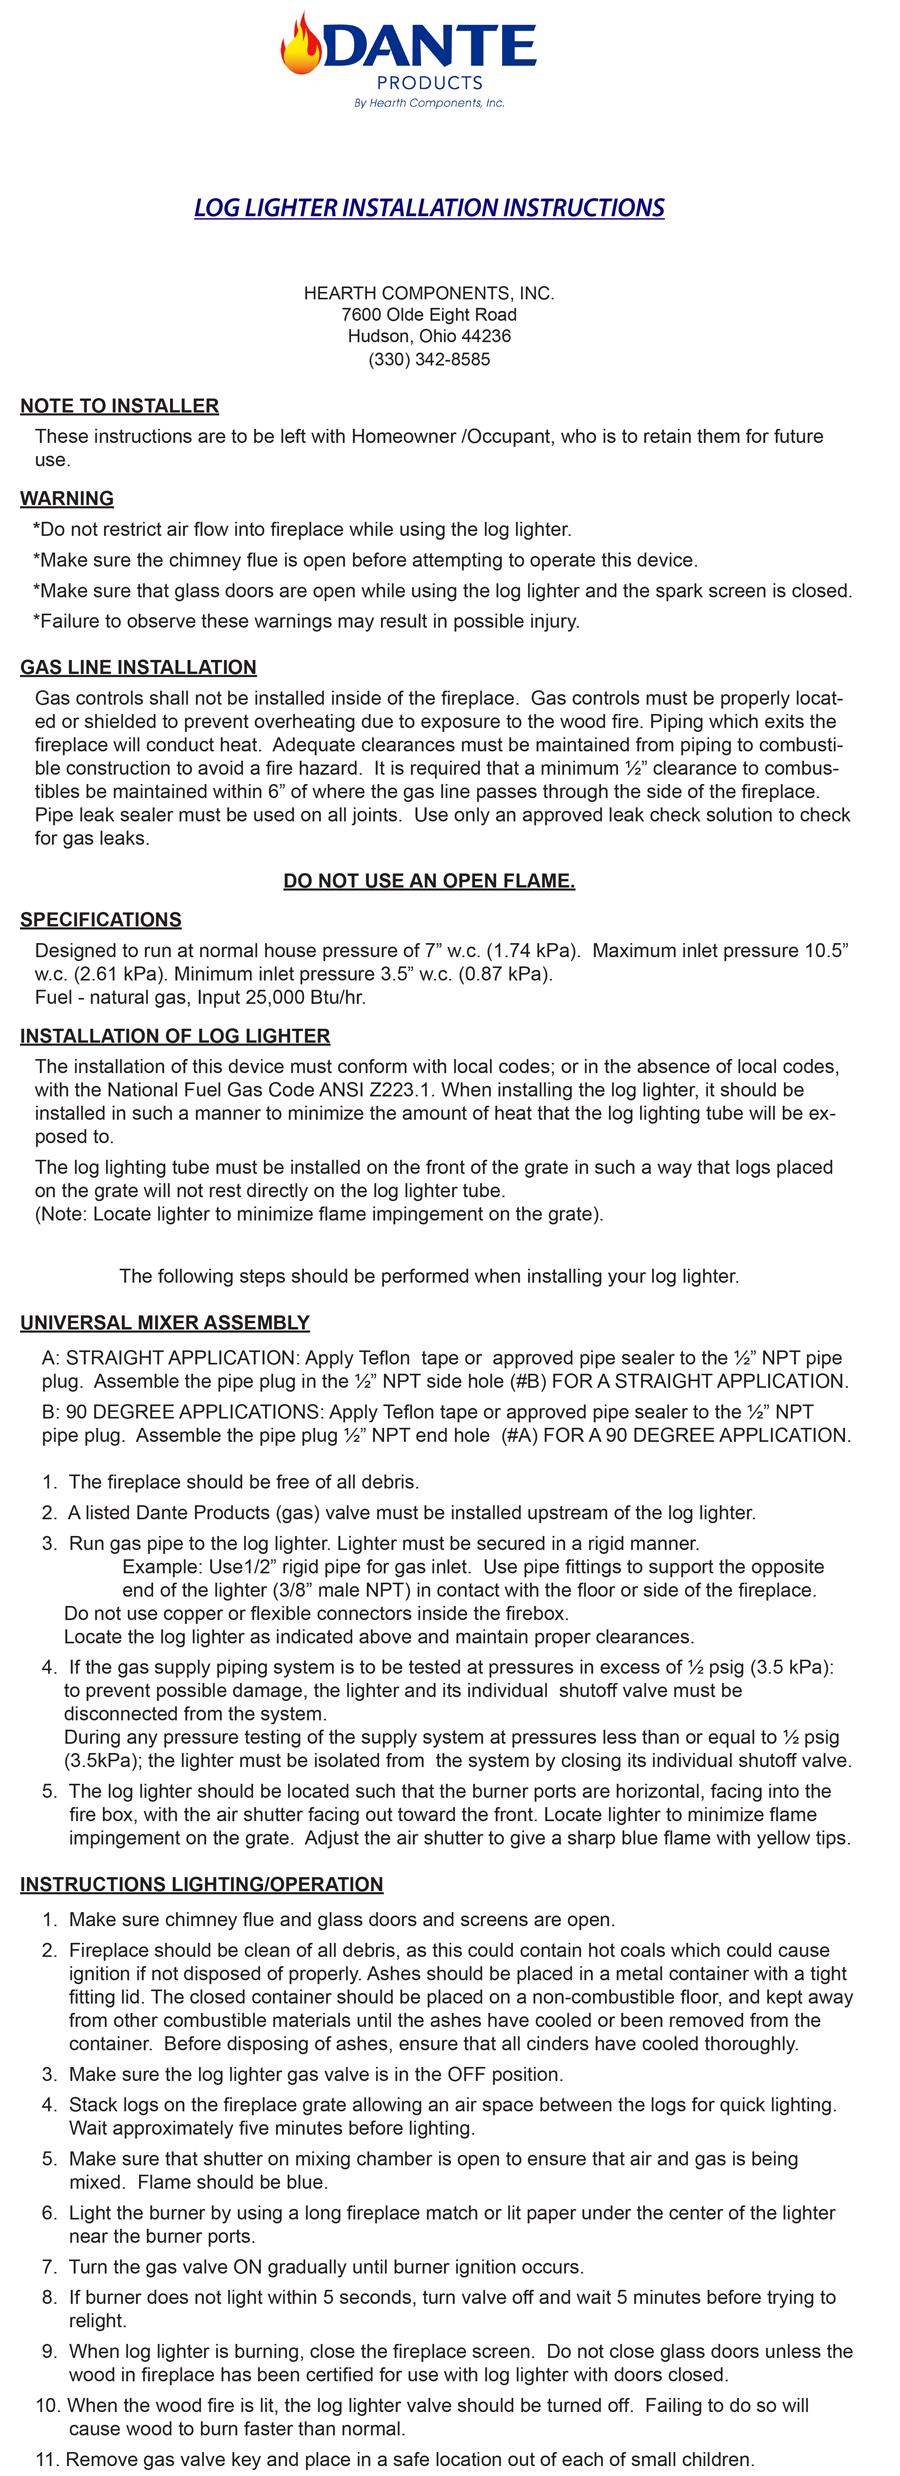 Dante Log Lighter Burner Installation Manual